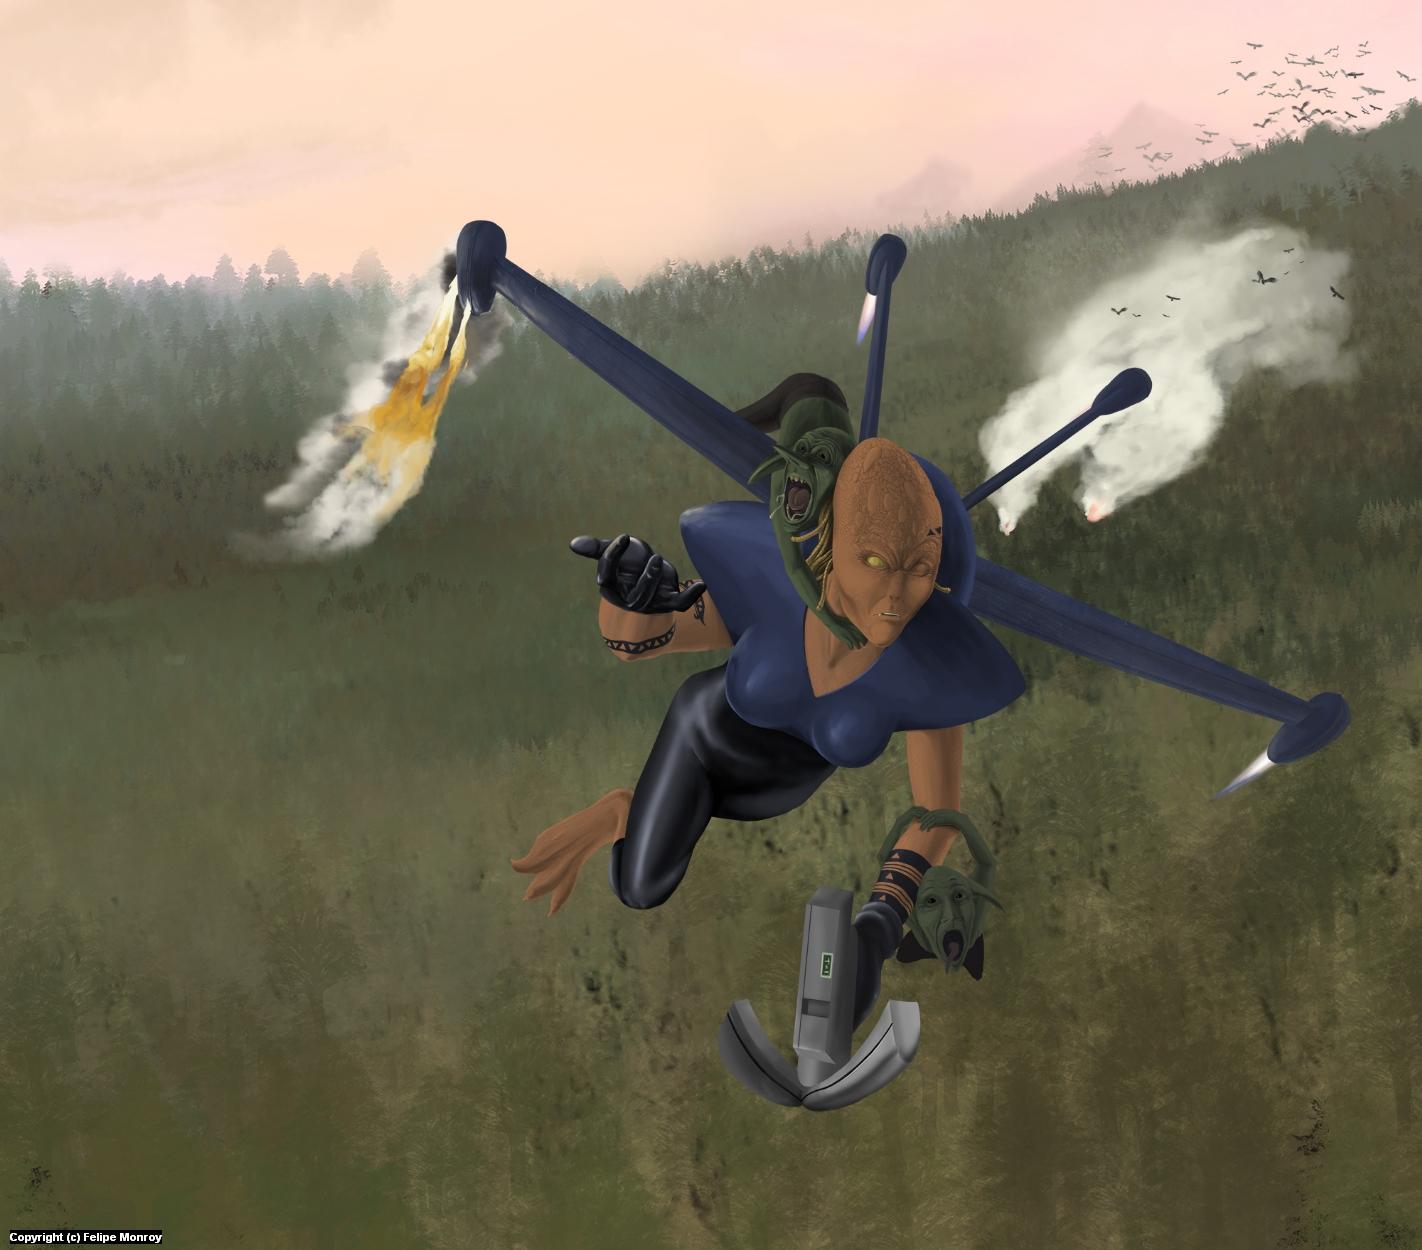 Flying Troubles Artwork by Felipe Monroy